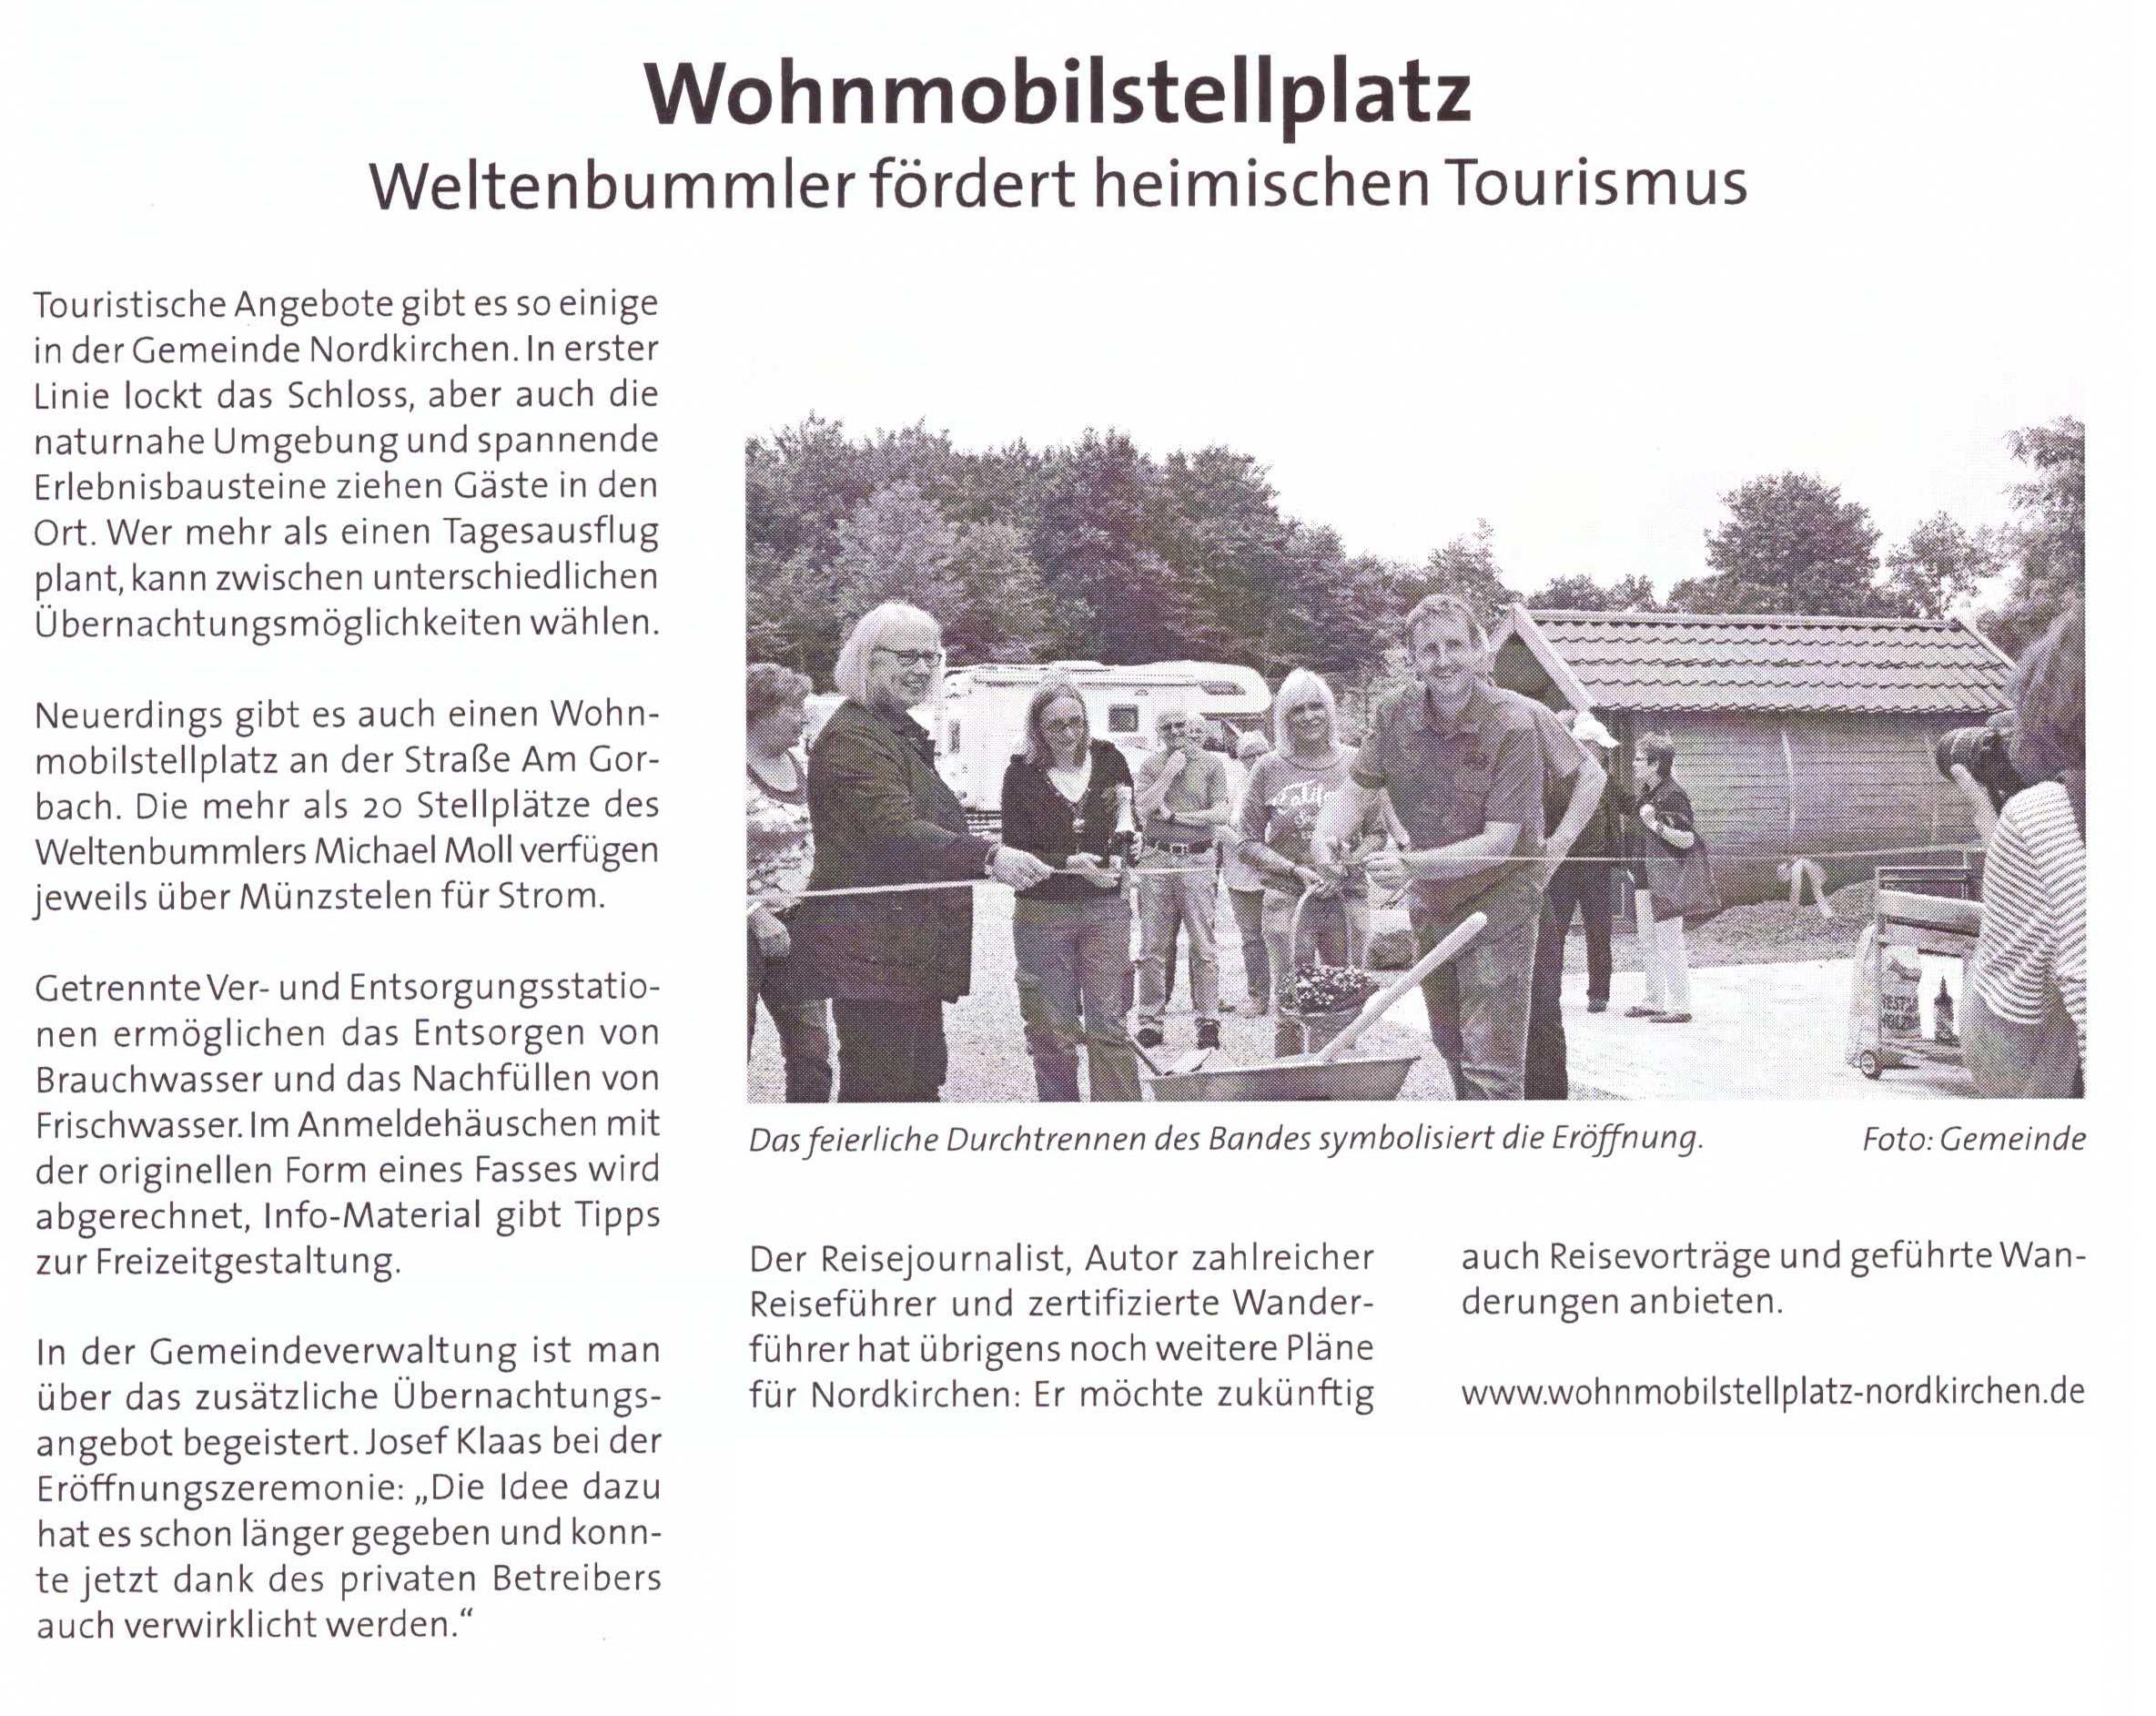 Nordkirchen life